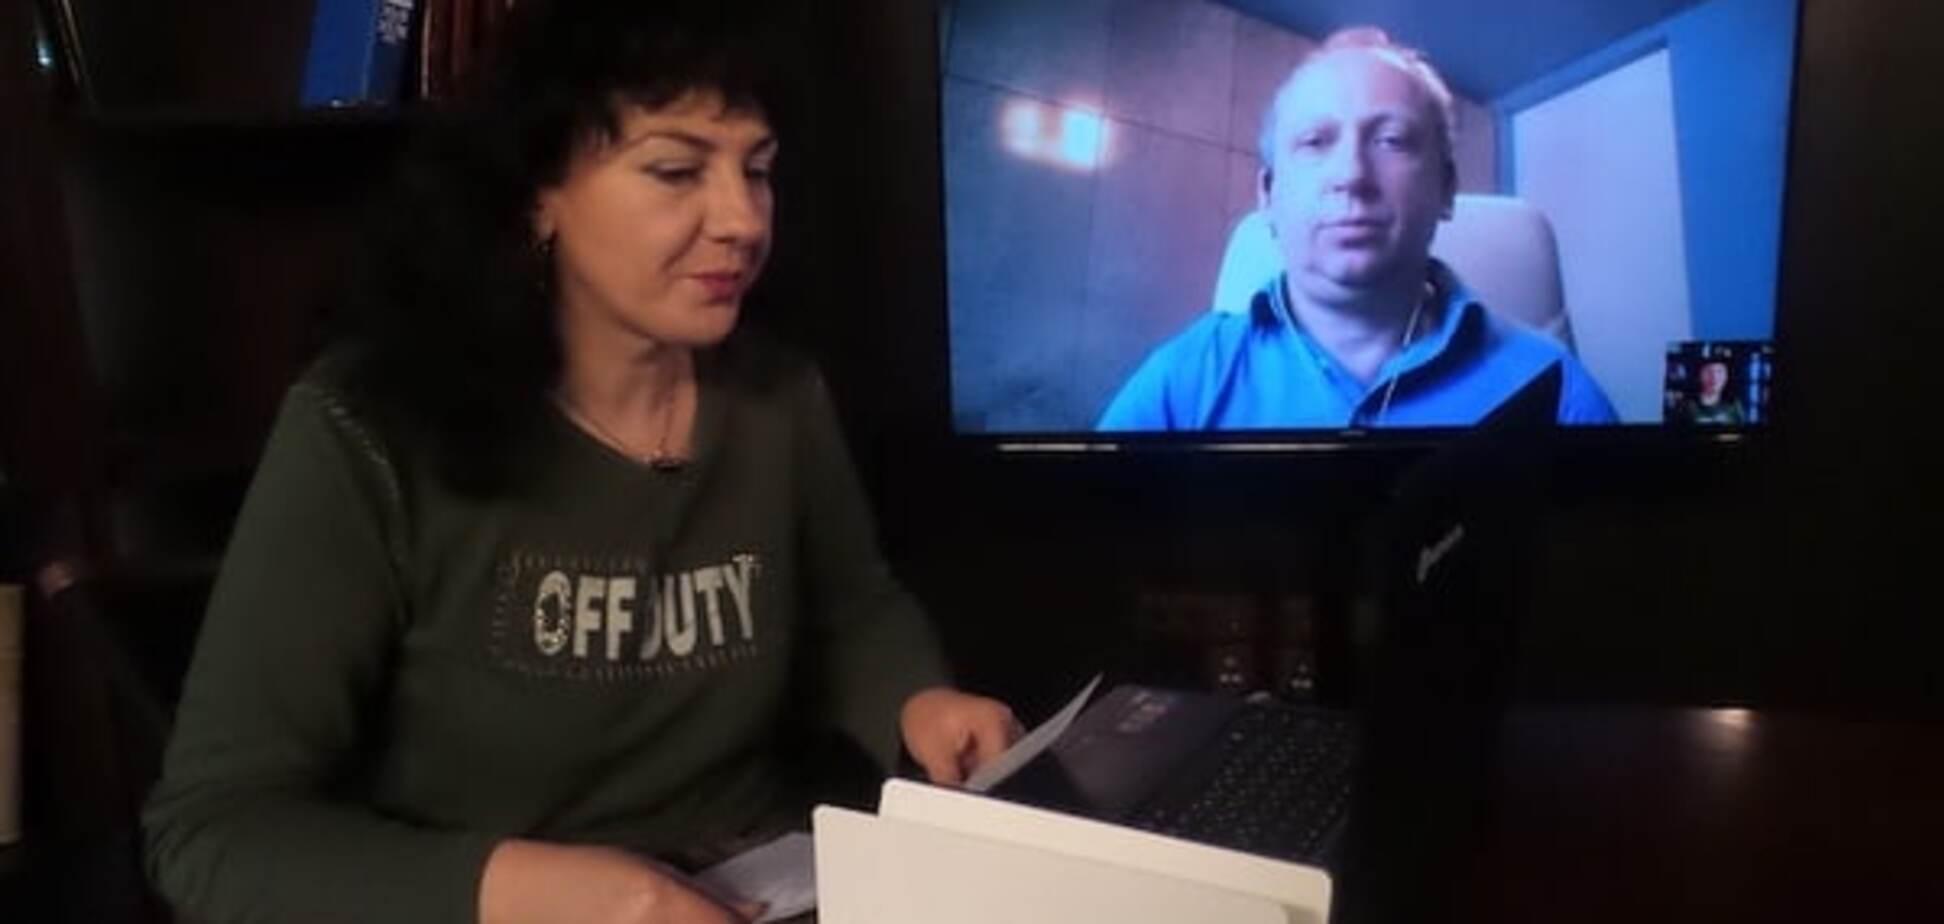 Путин никогда не уйдет с Донбасса - Слава Рабинович